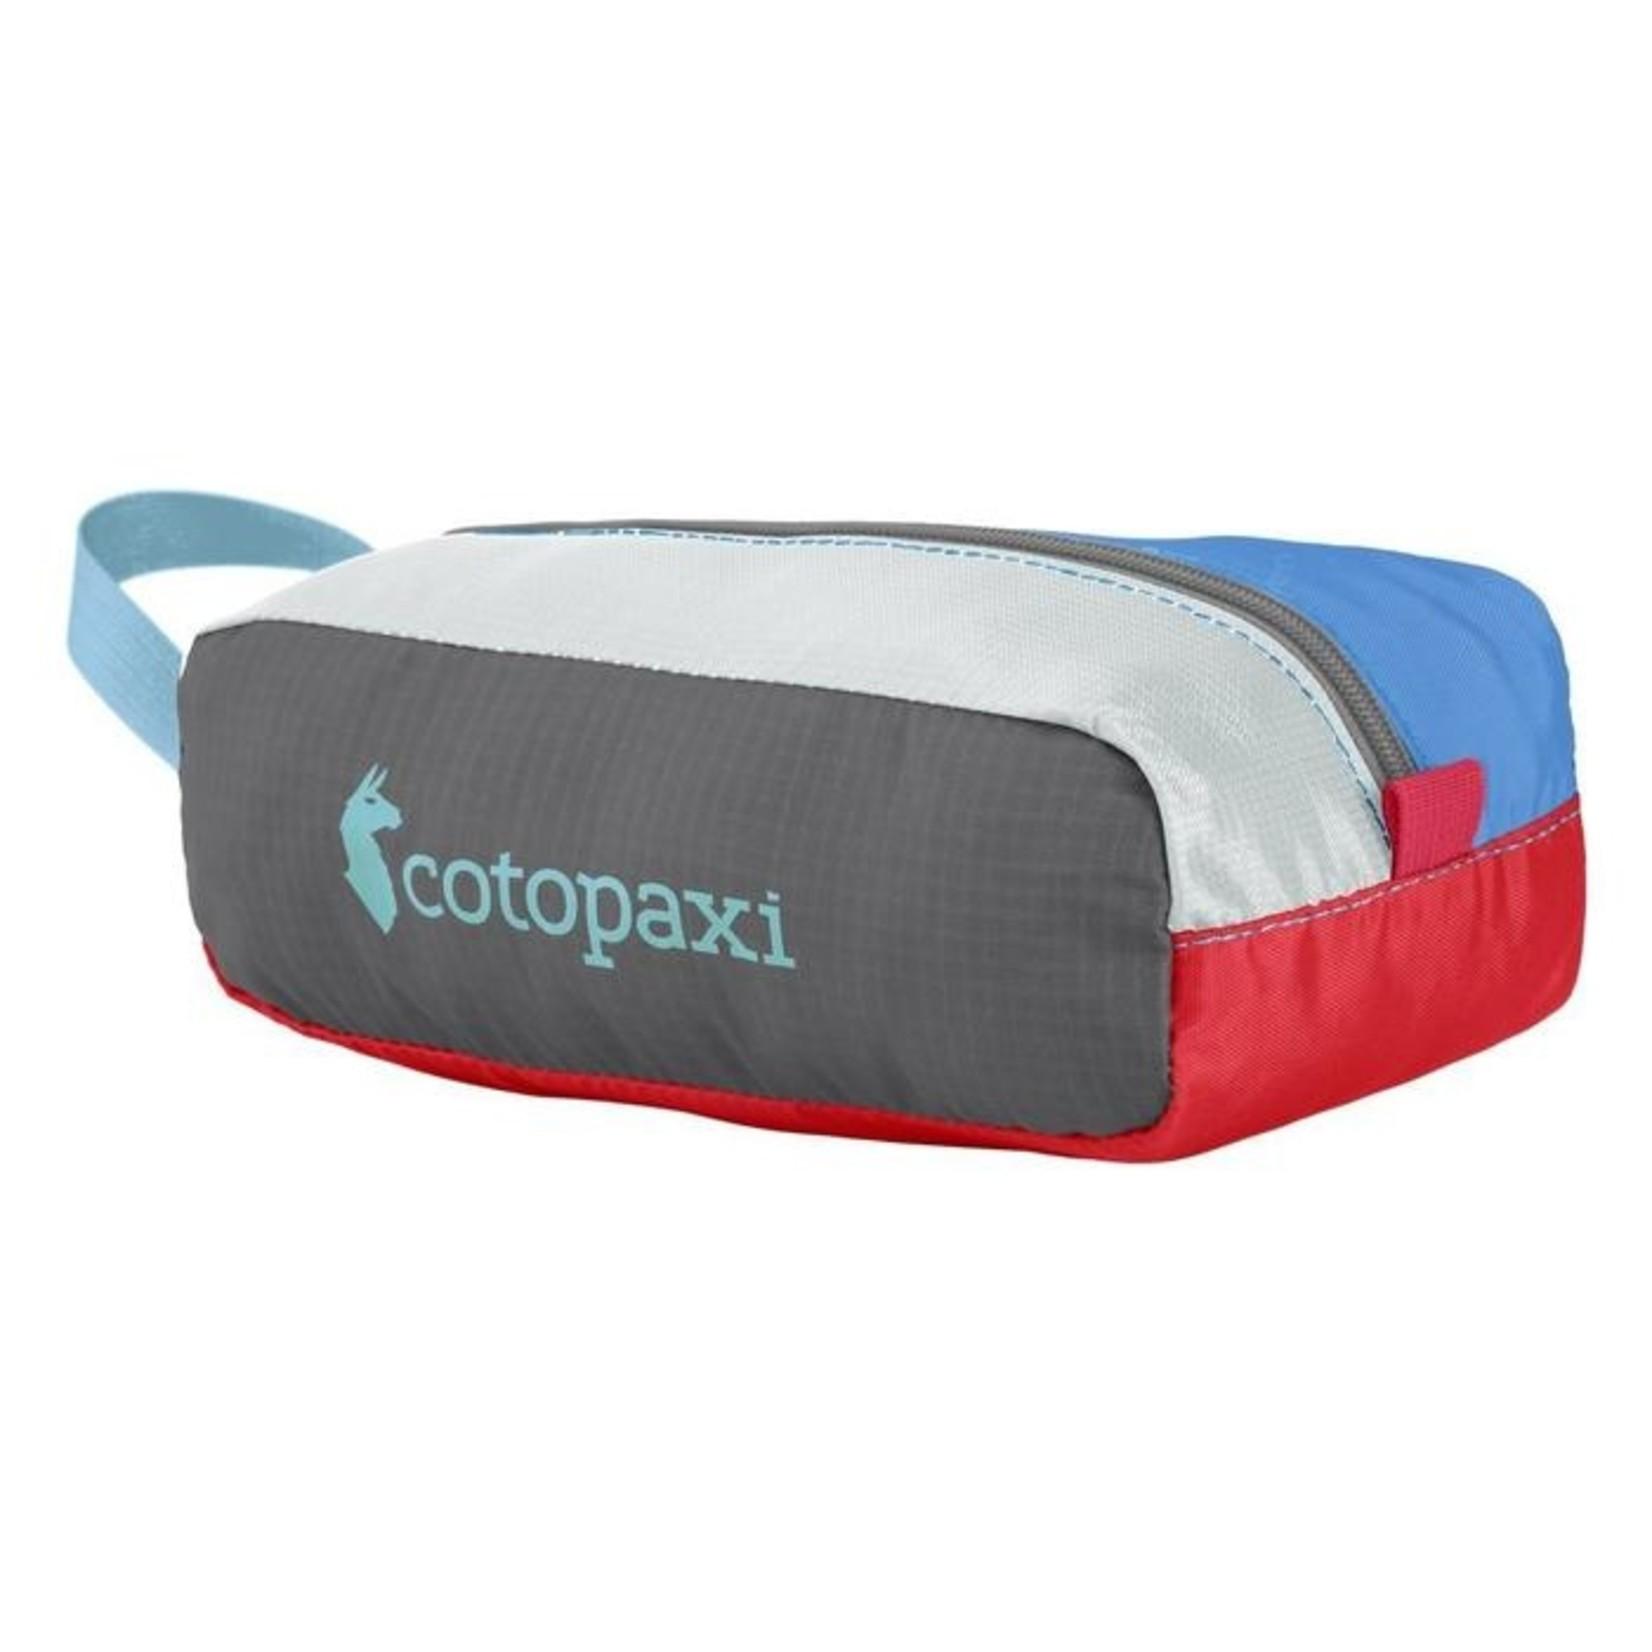 Cotopaxi Cotopaxi Dopp Kit - Del Dia